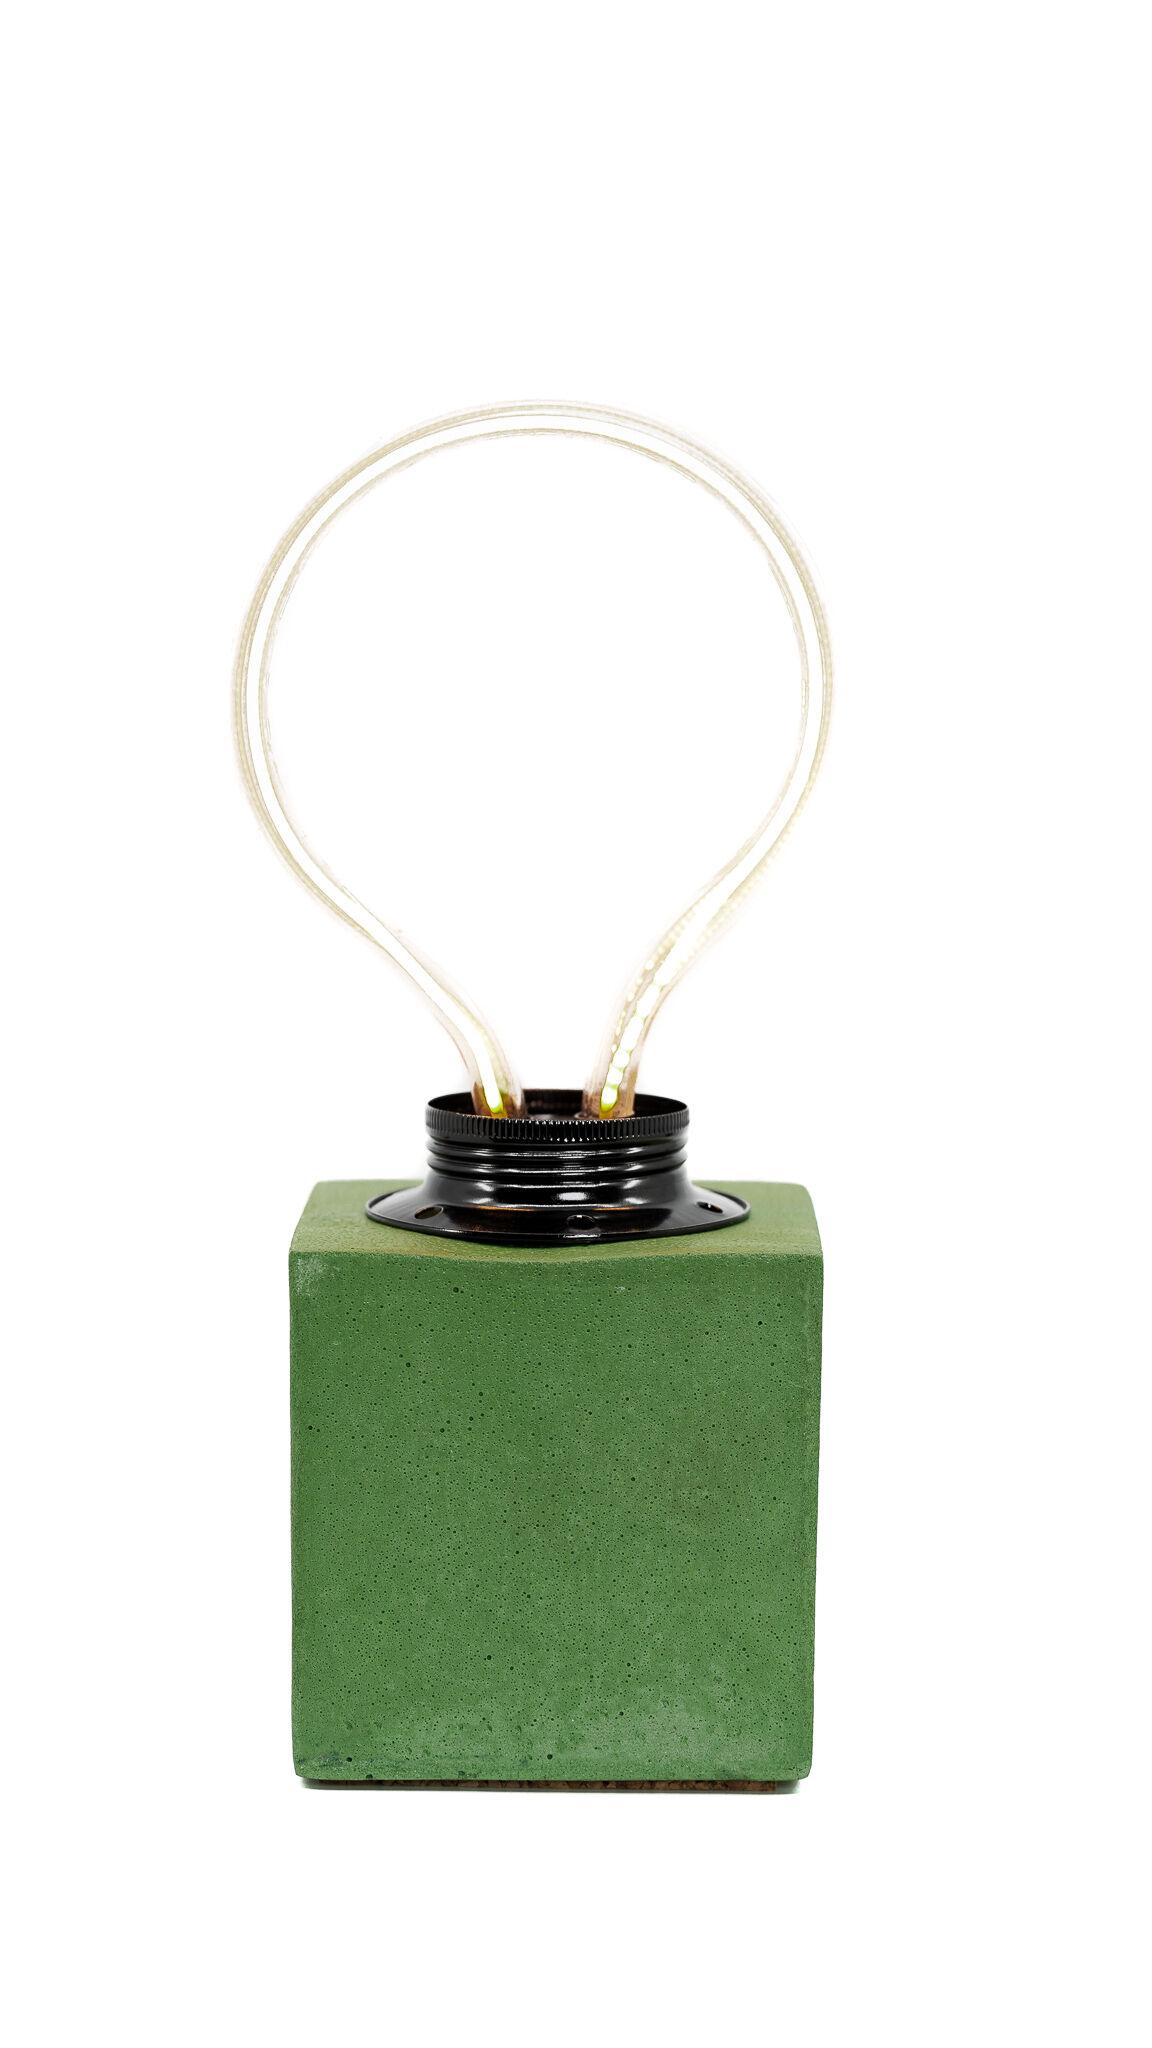 Junny Lampe cube néon en béton vert fabrication artisanale